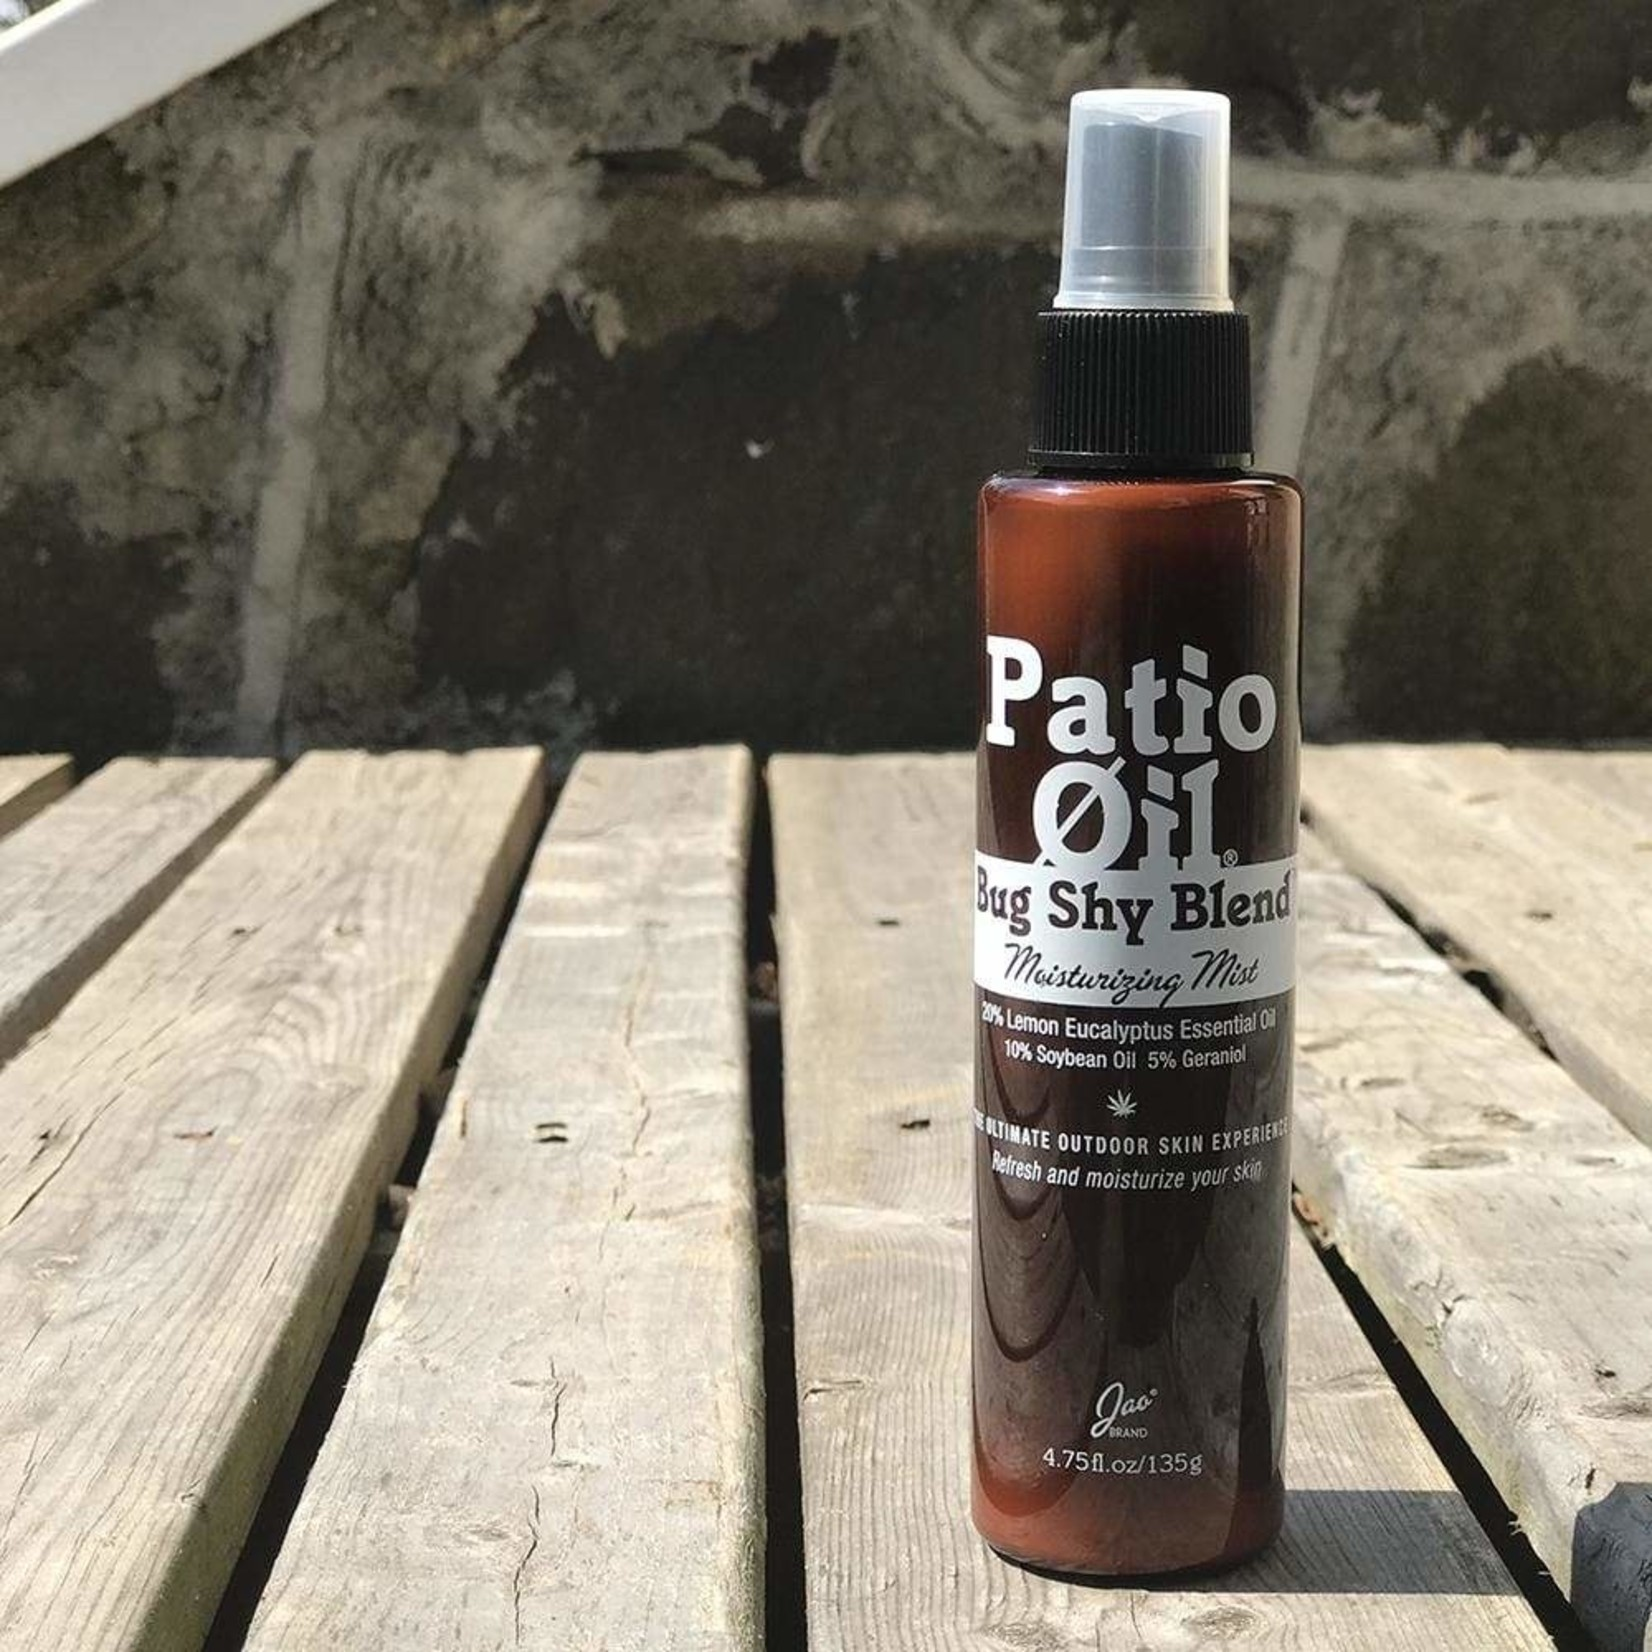 Jao Jao Patio Oil Moisturizing Mist  (4.75oz/135g)